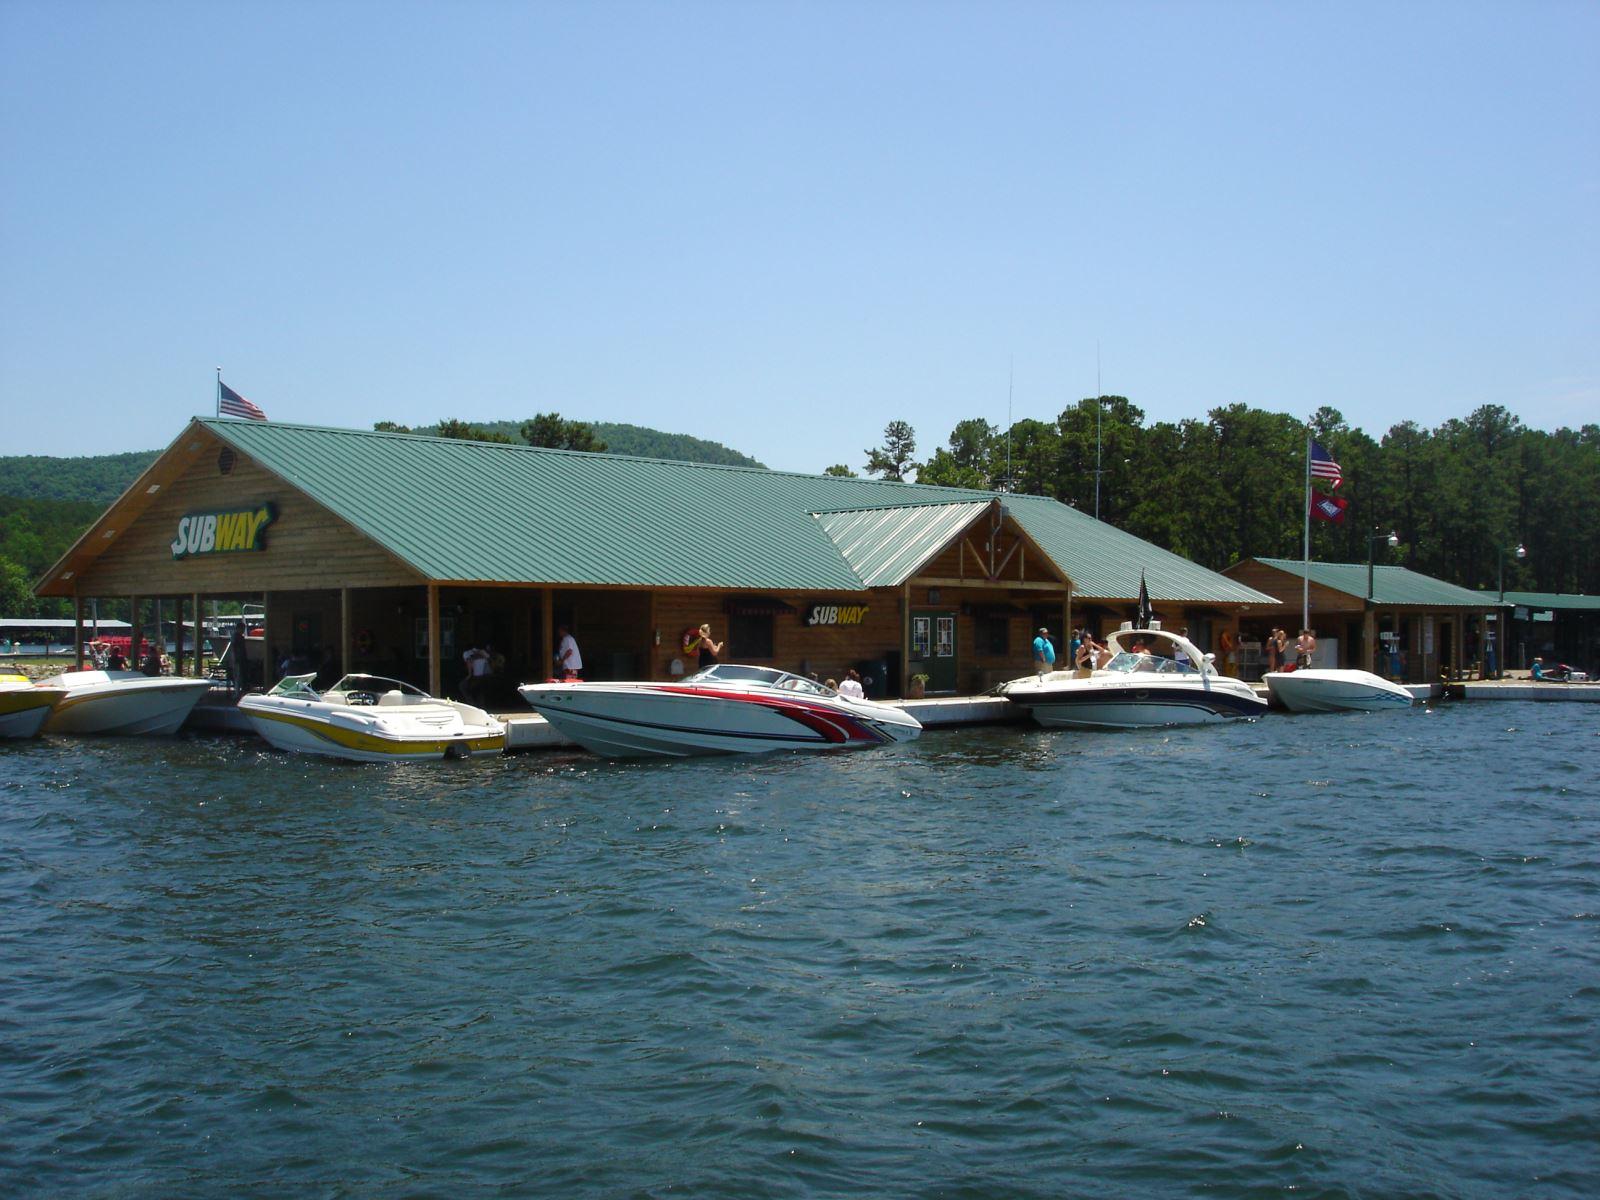 mountain harbor resort and spa | houseboat magazine